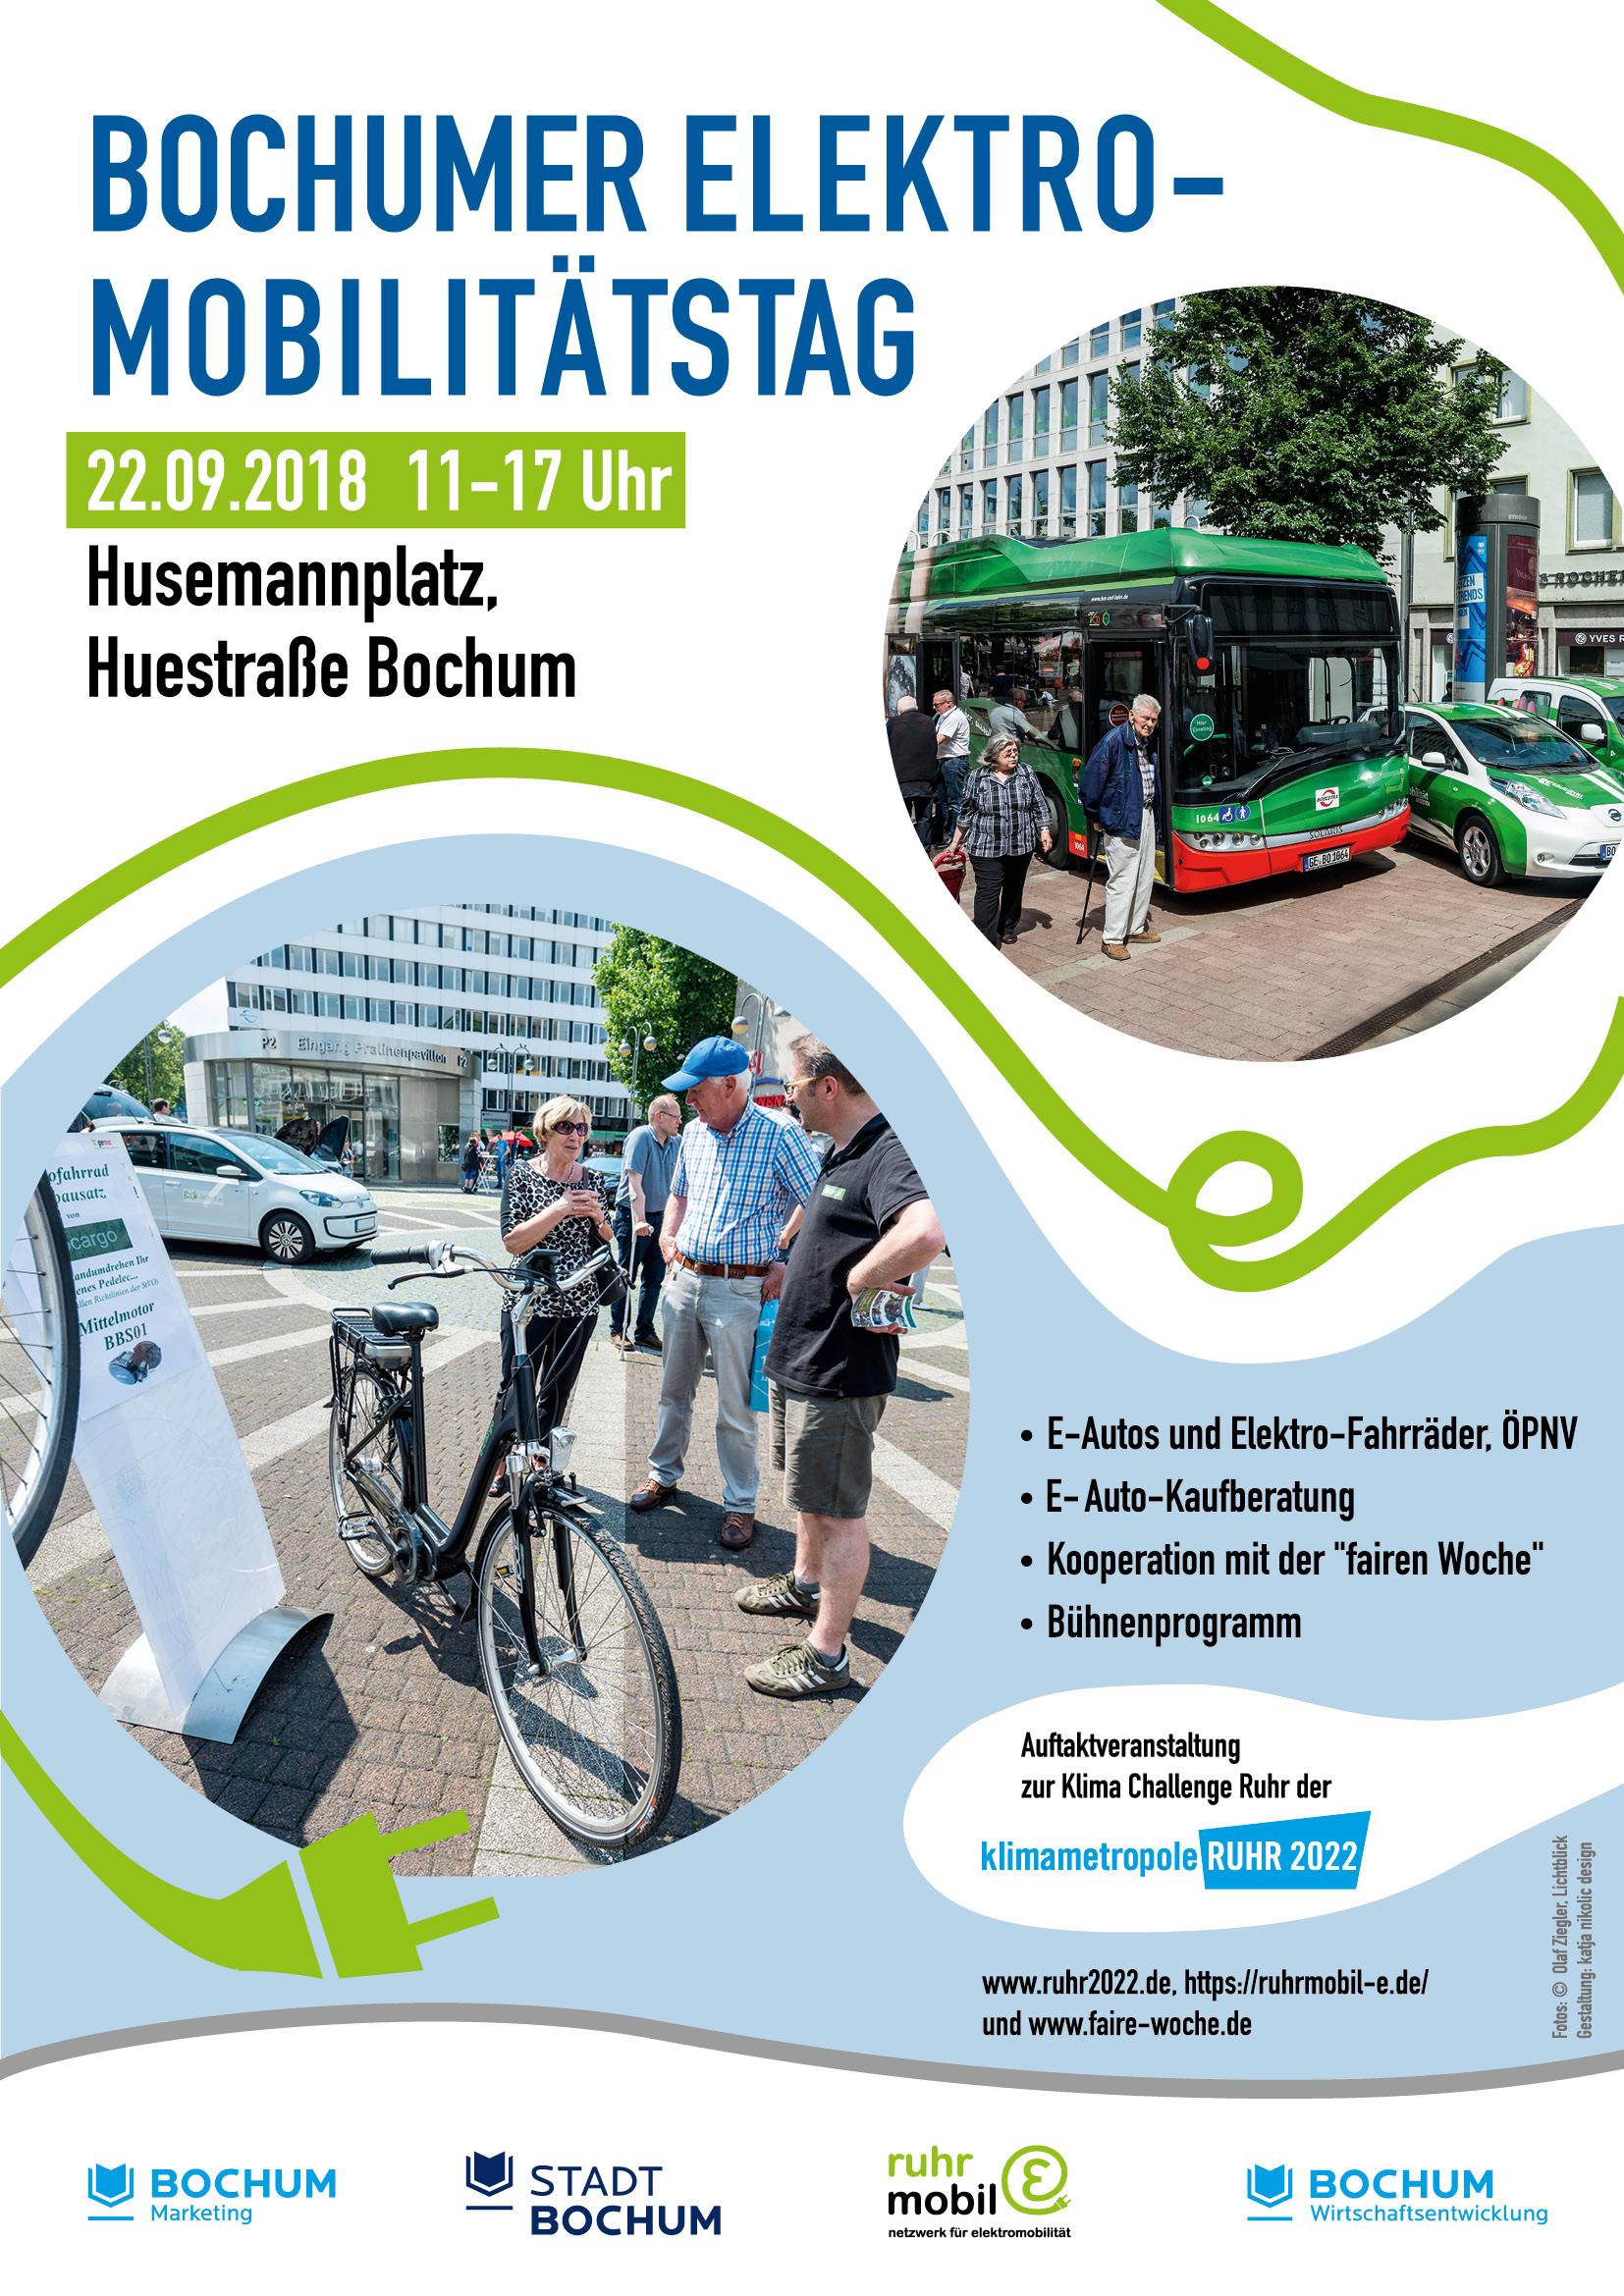 Plakat zum Elektromobilitätstag Fotos: Olaf Ziegler, Lichtblick  Gestaltung: katja nikolic design